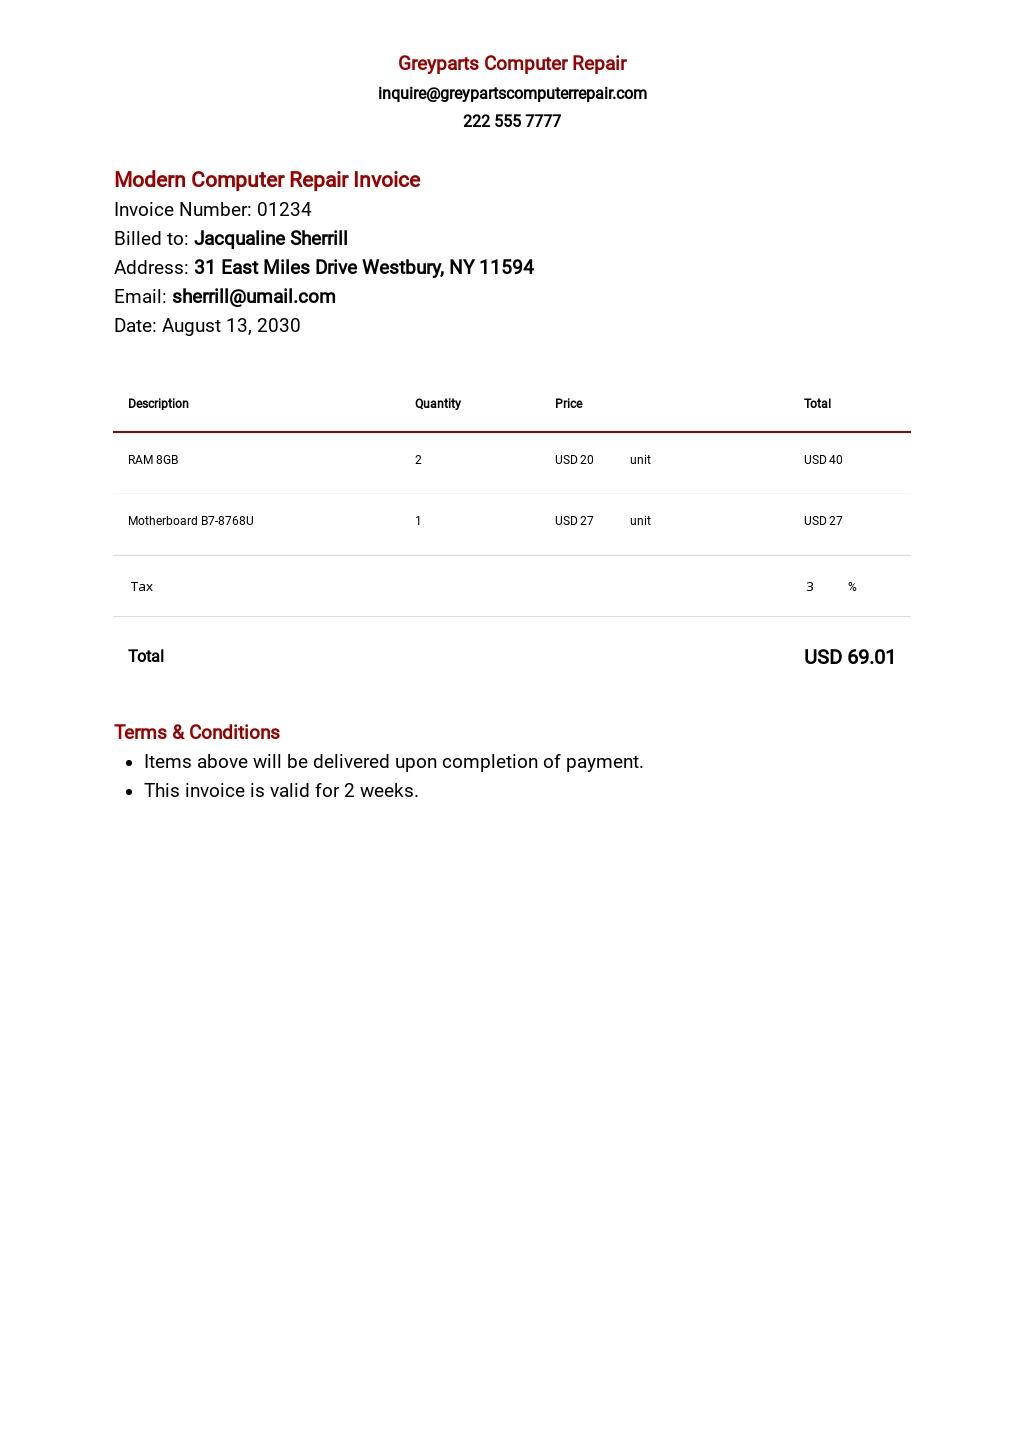 Modern Computer Repair Invoice Template